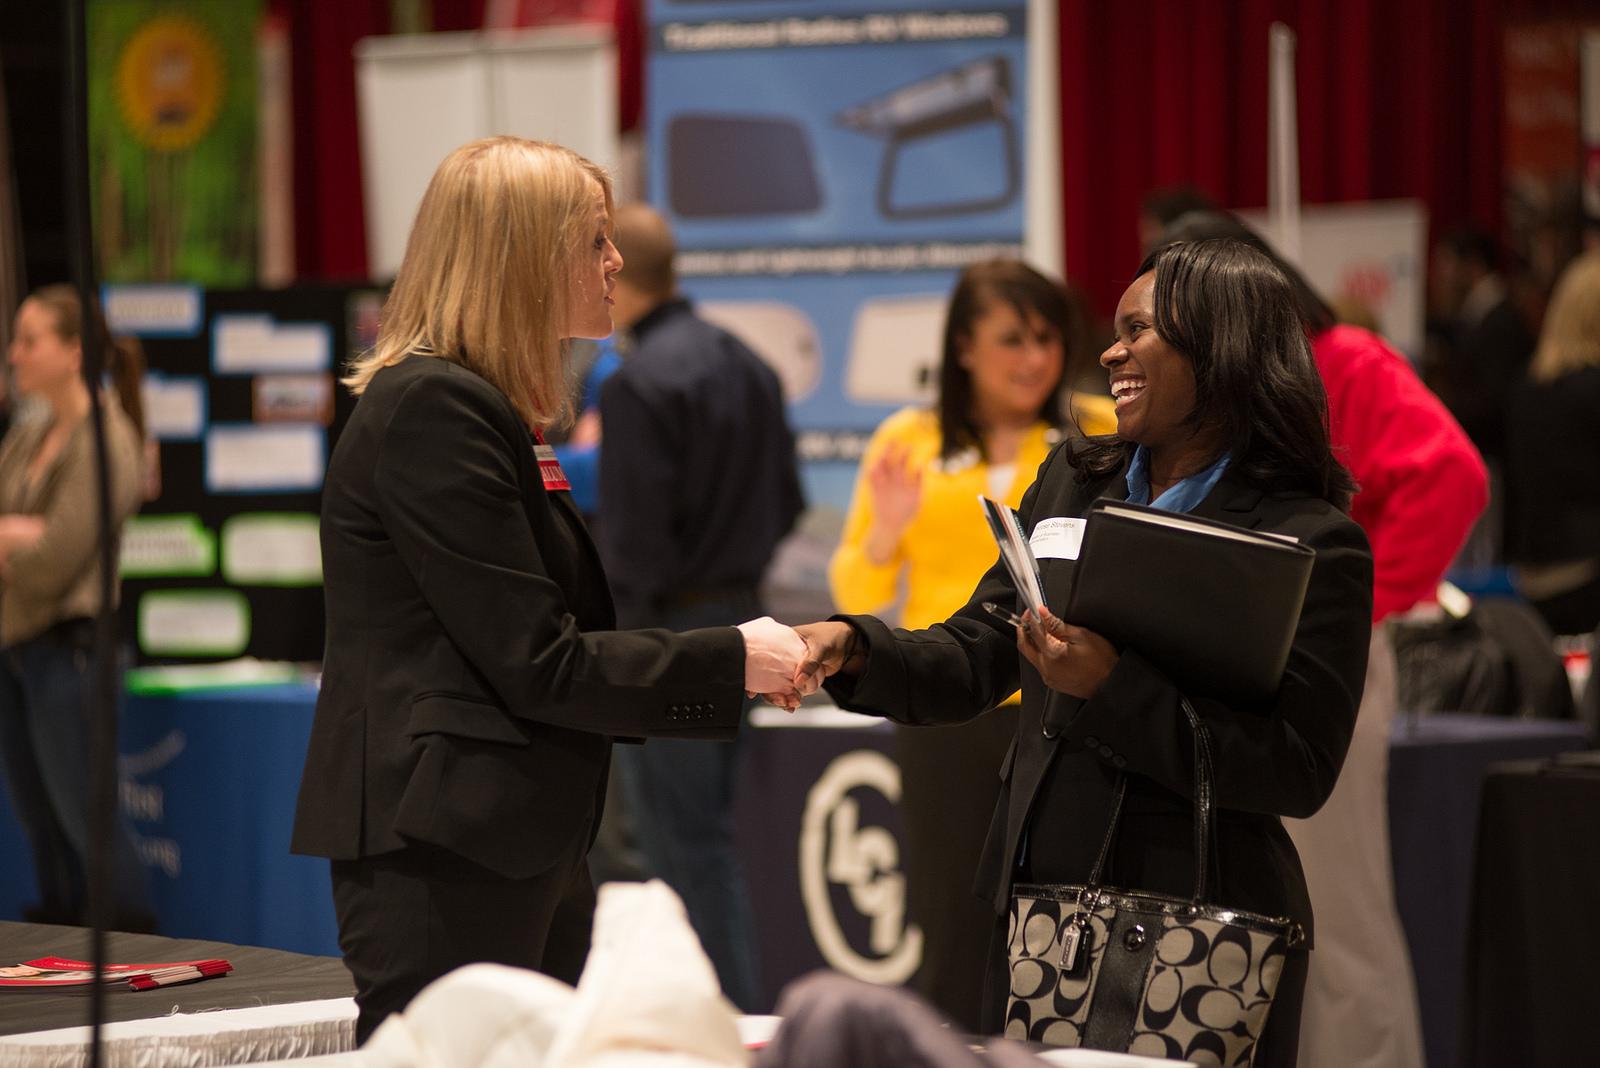 A student talks to a prospective employer at a Career Center job fair